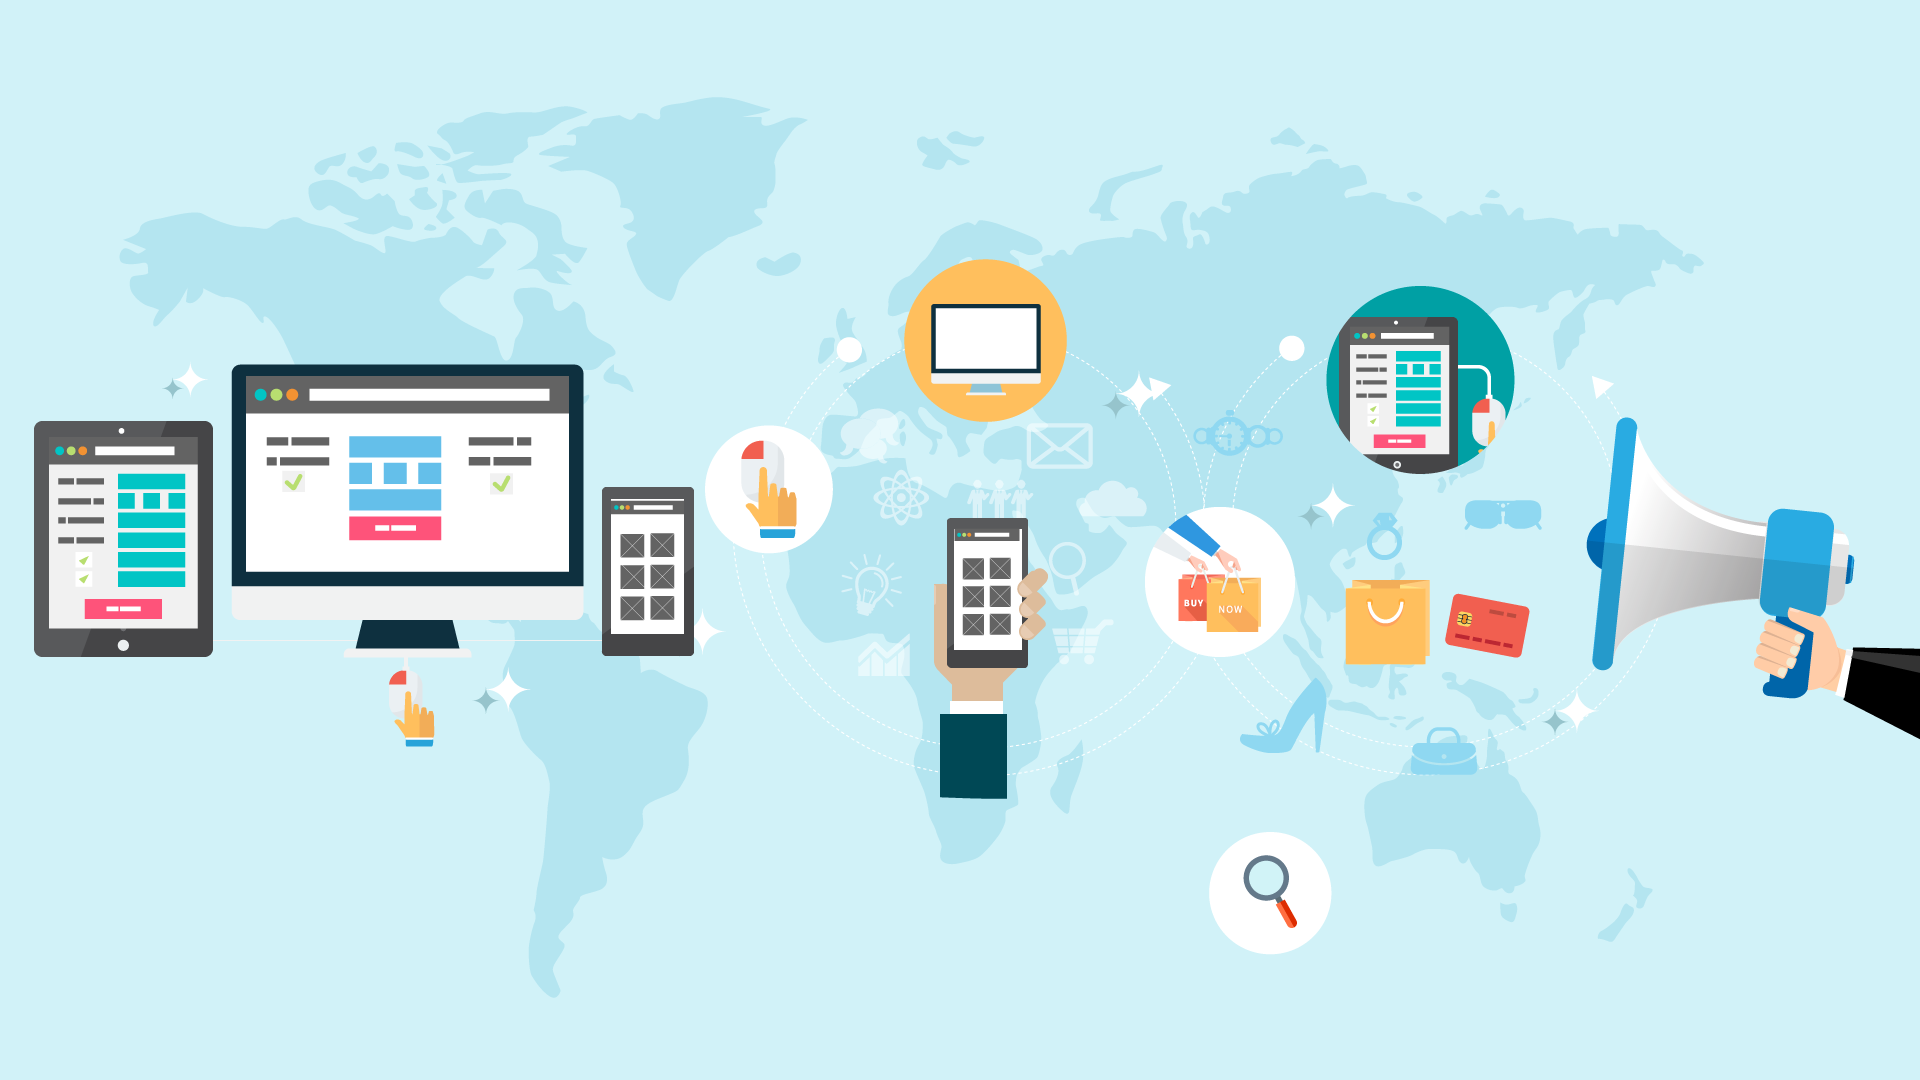 Digital-Marketing-Plan-For-Small-Medium-Businesses1